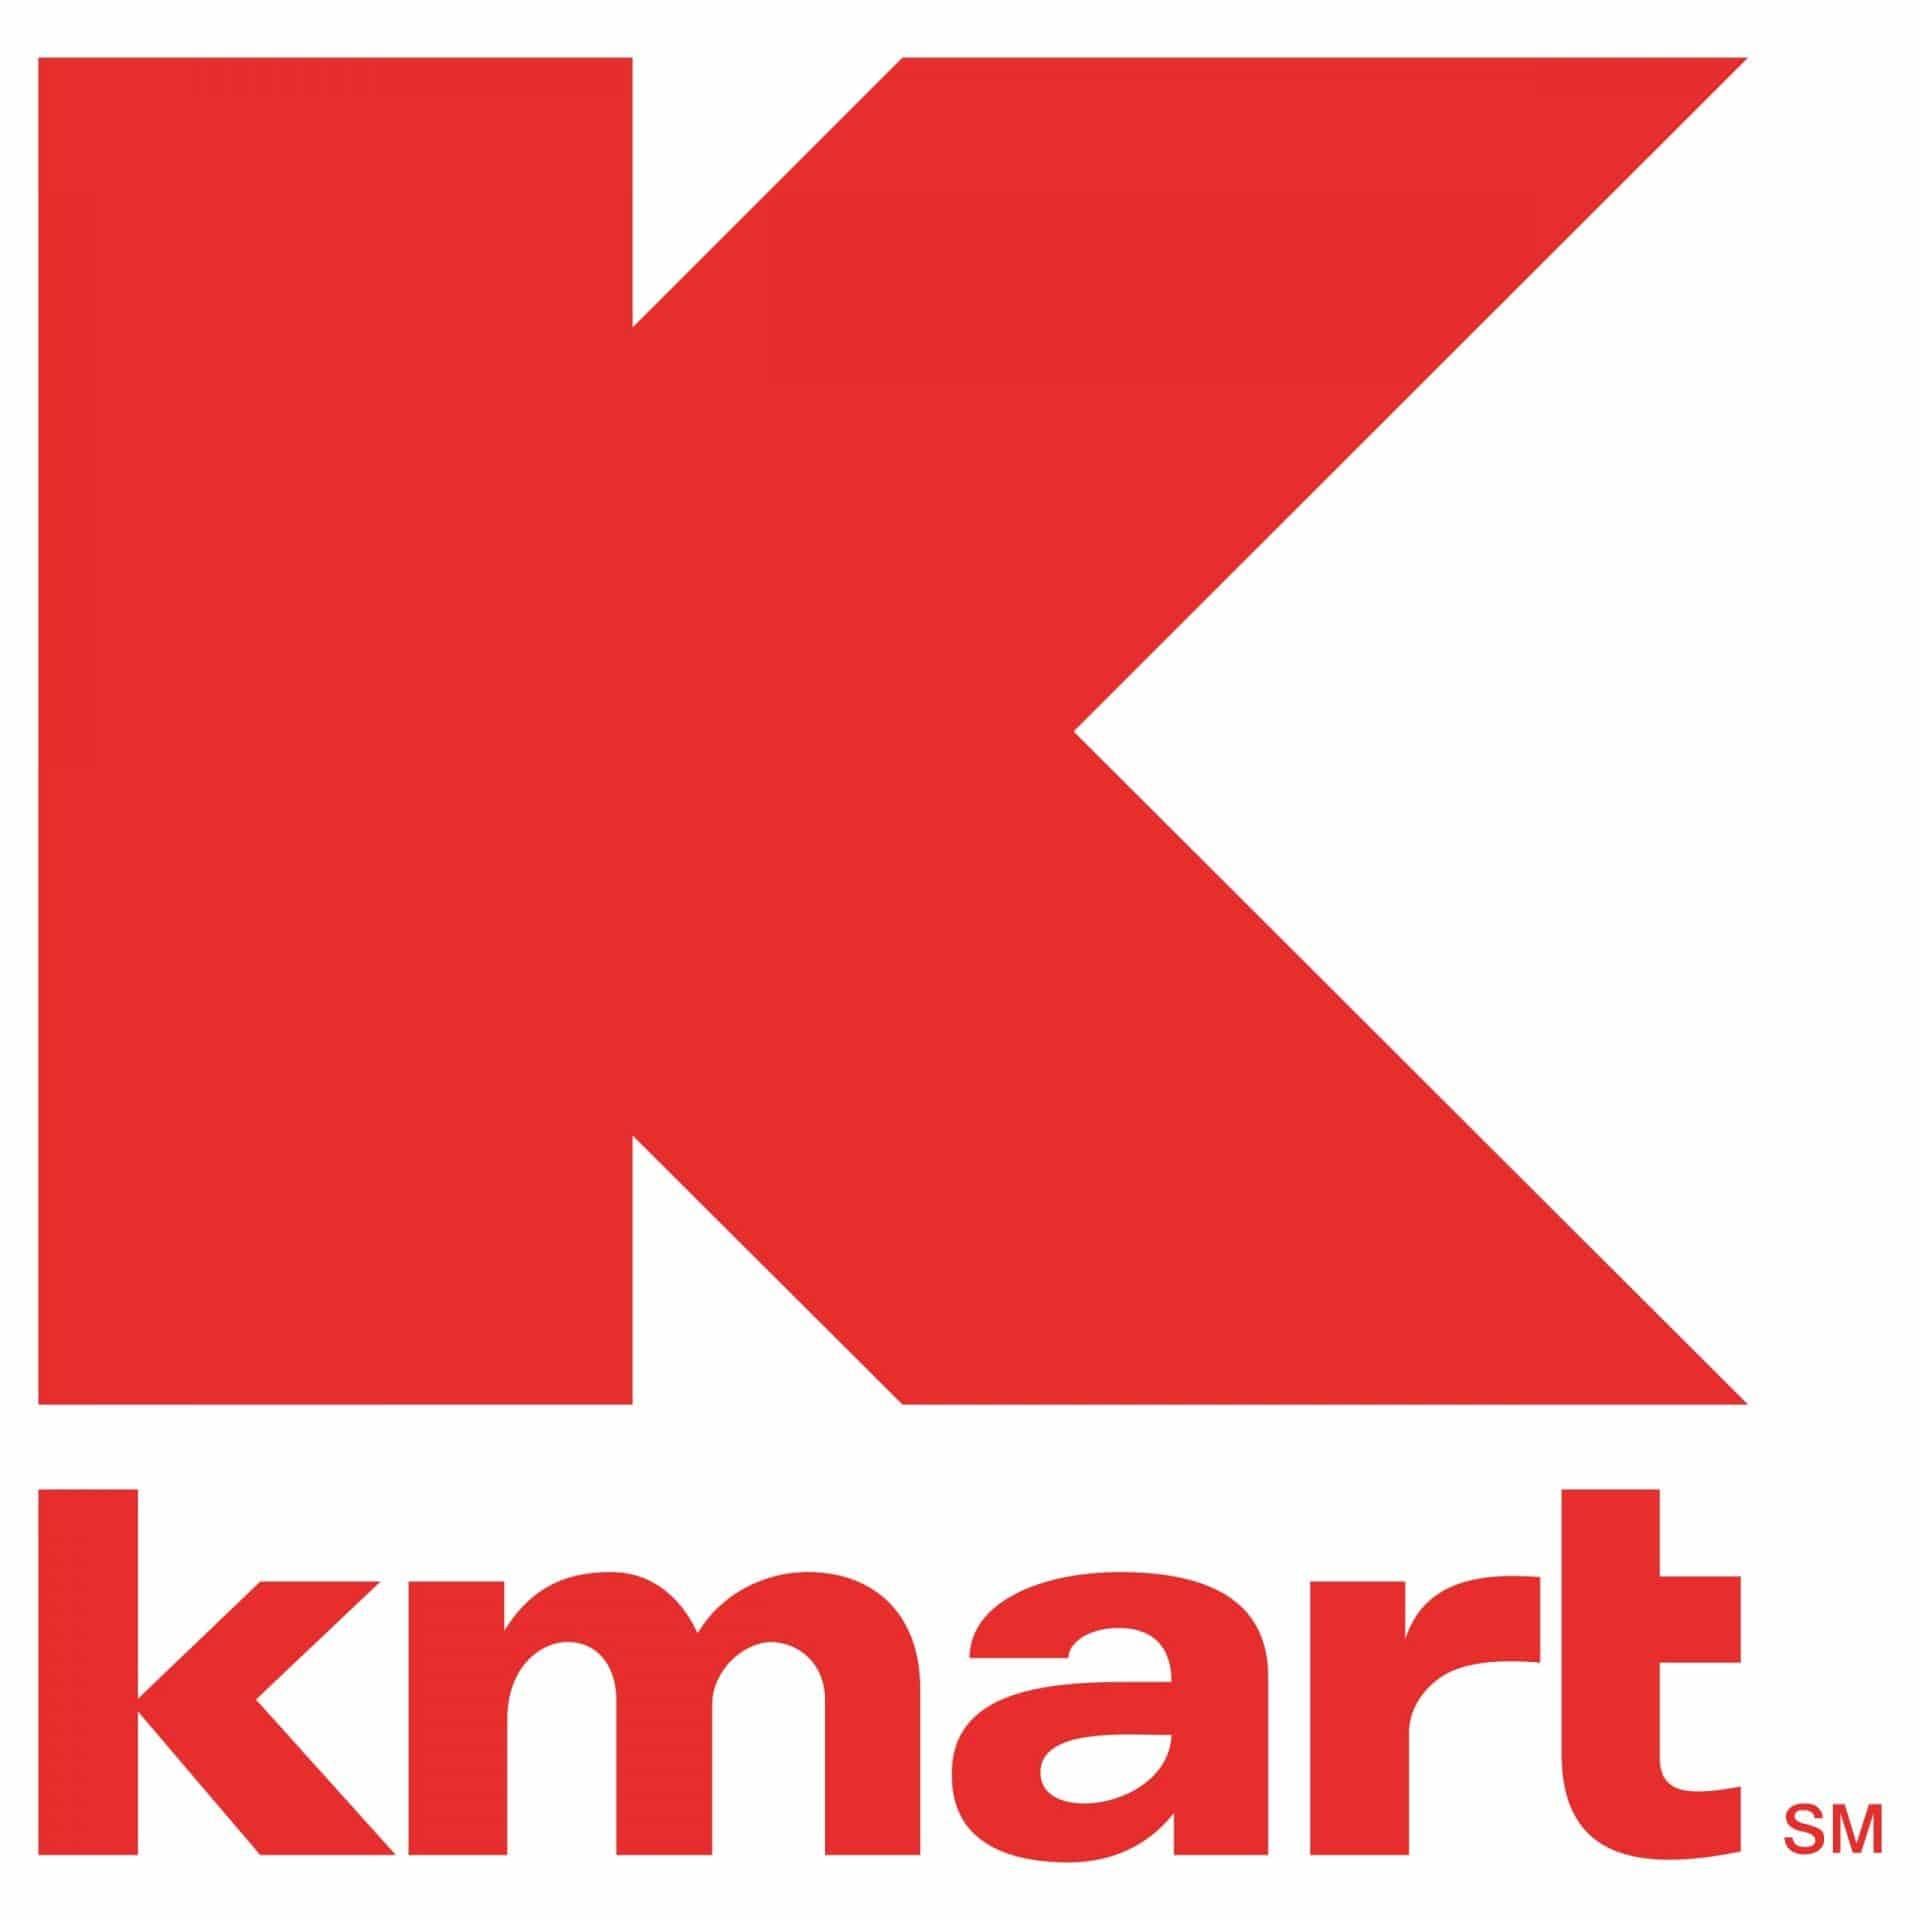 Last Kmart in North Carolina to Close